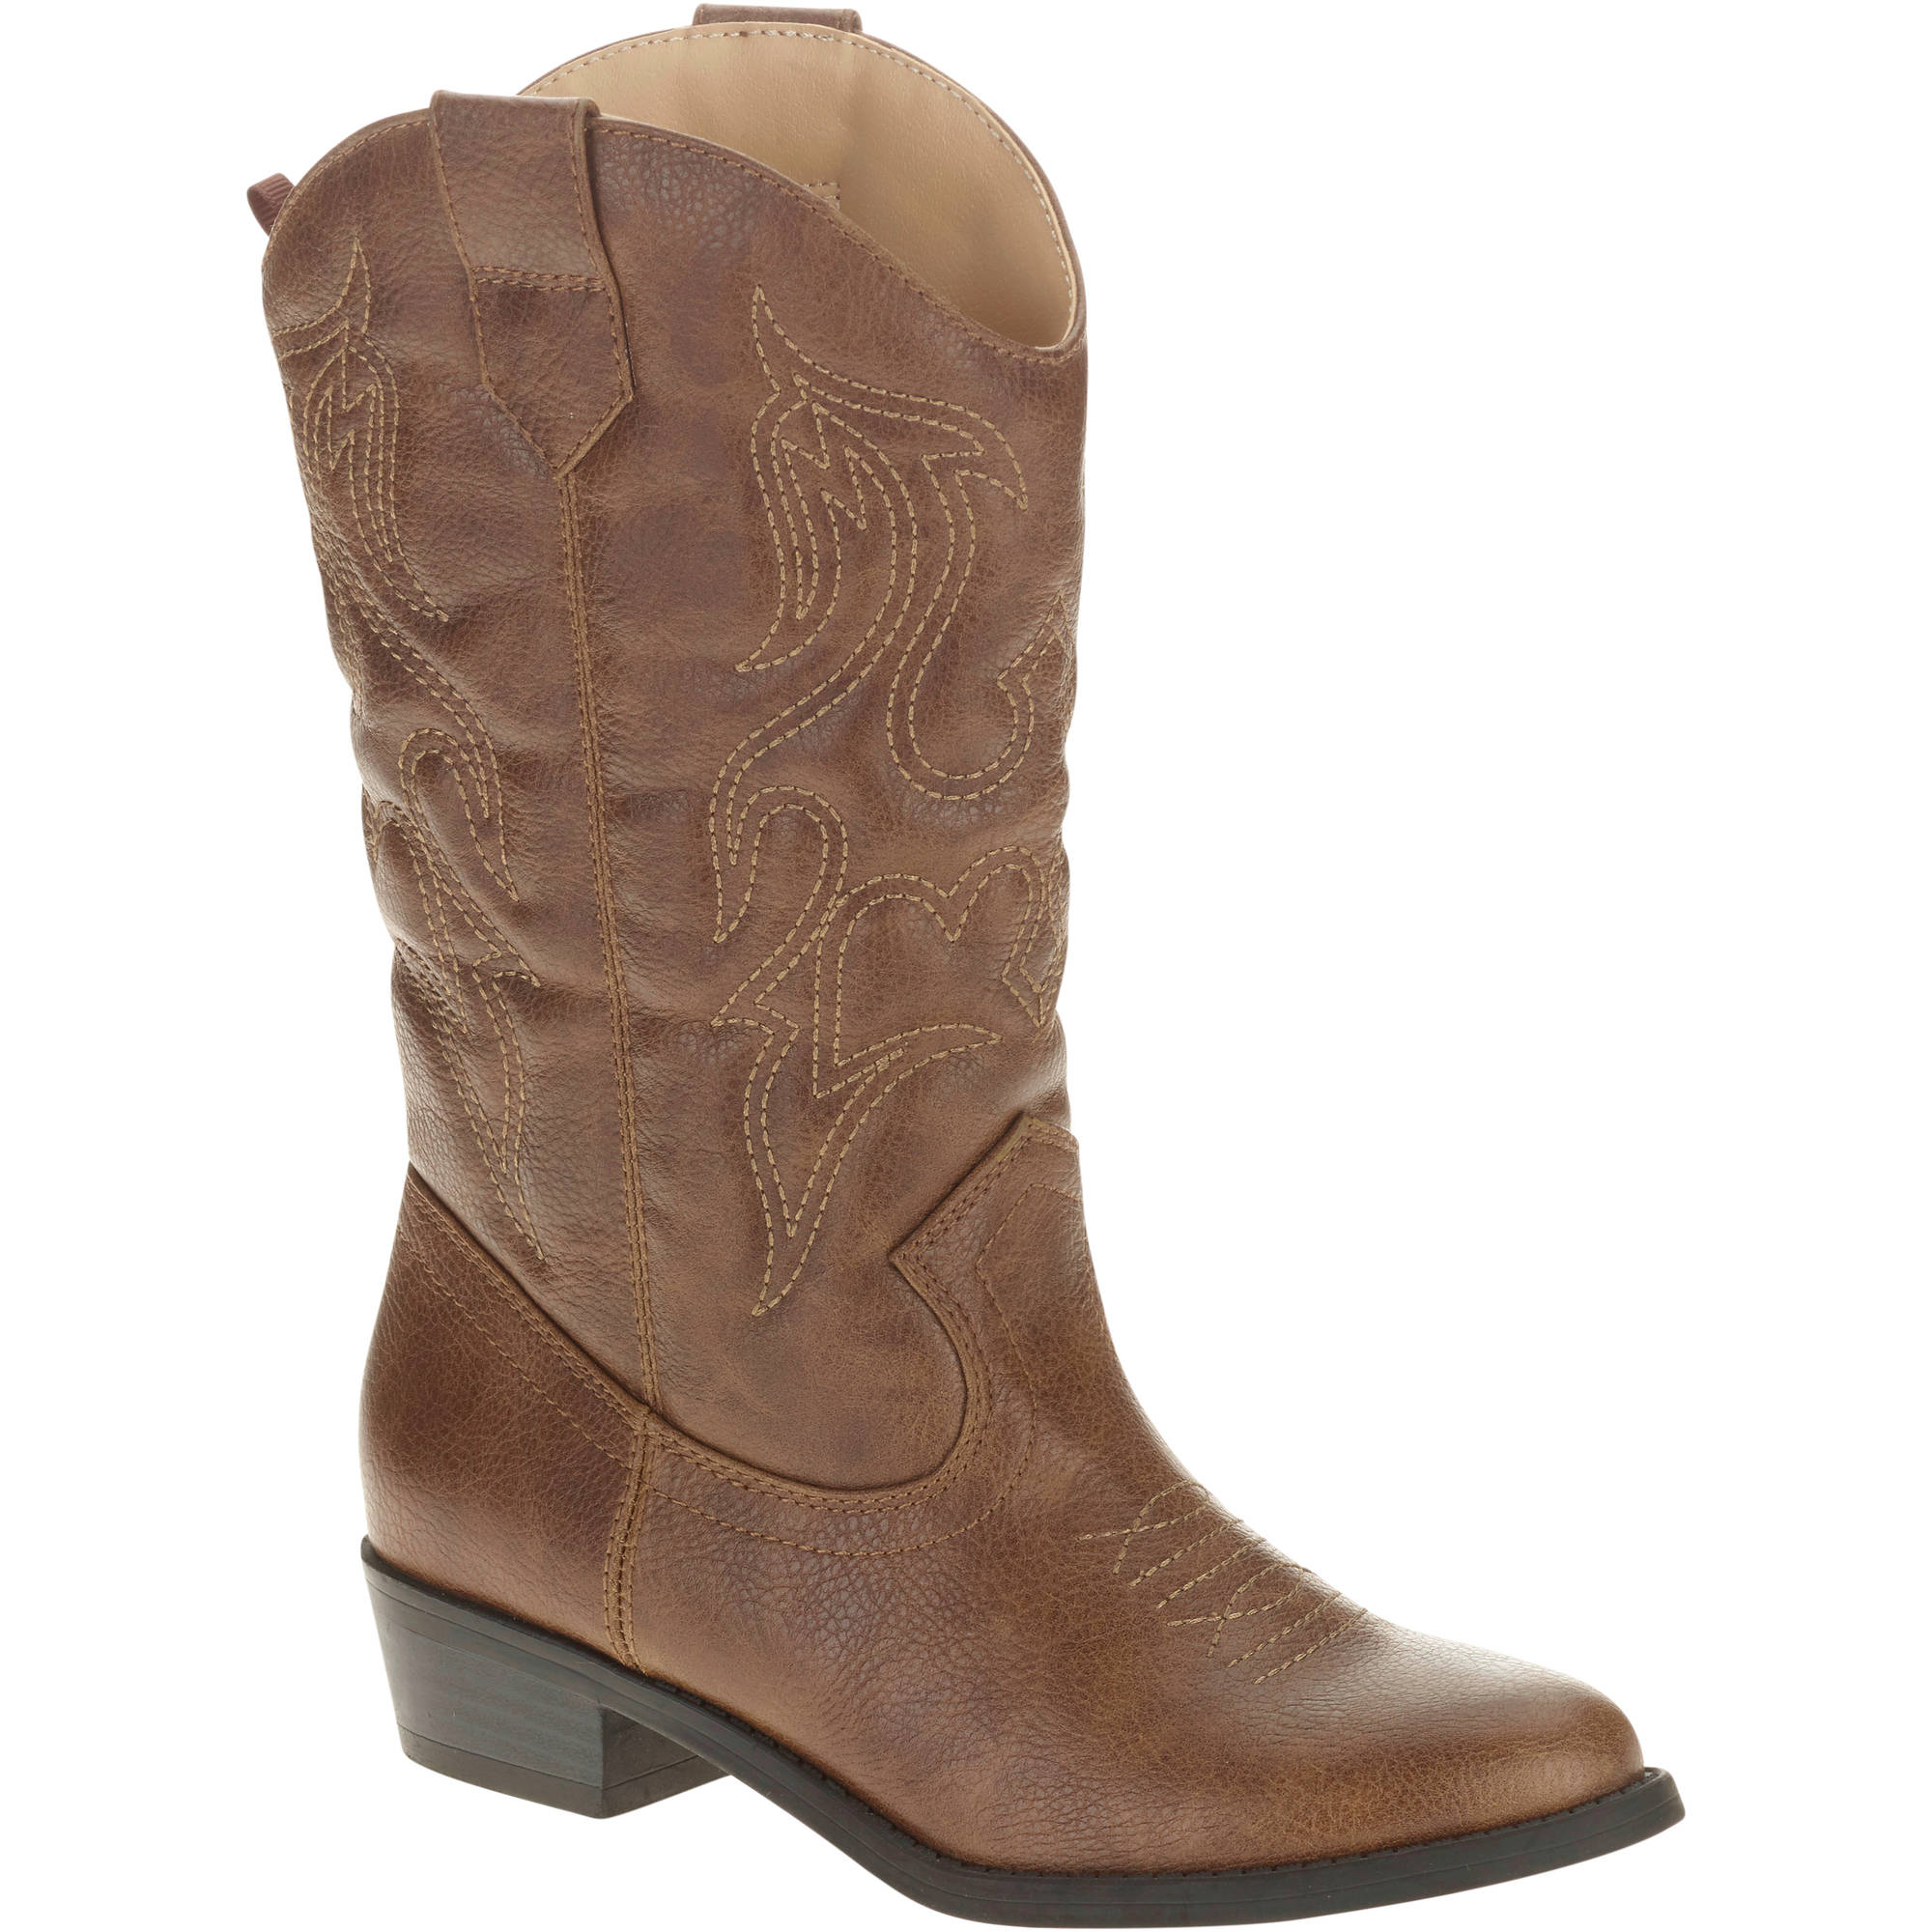 Faded Glory Girls' Cowgirl Boot - Walmart.com